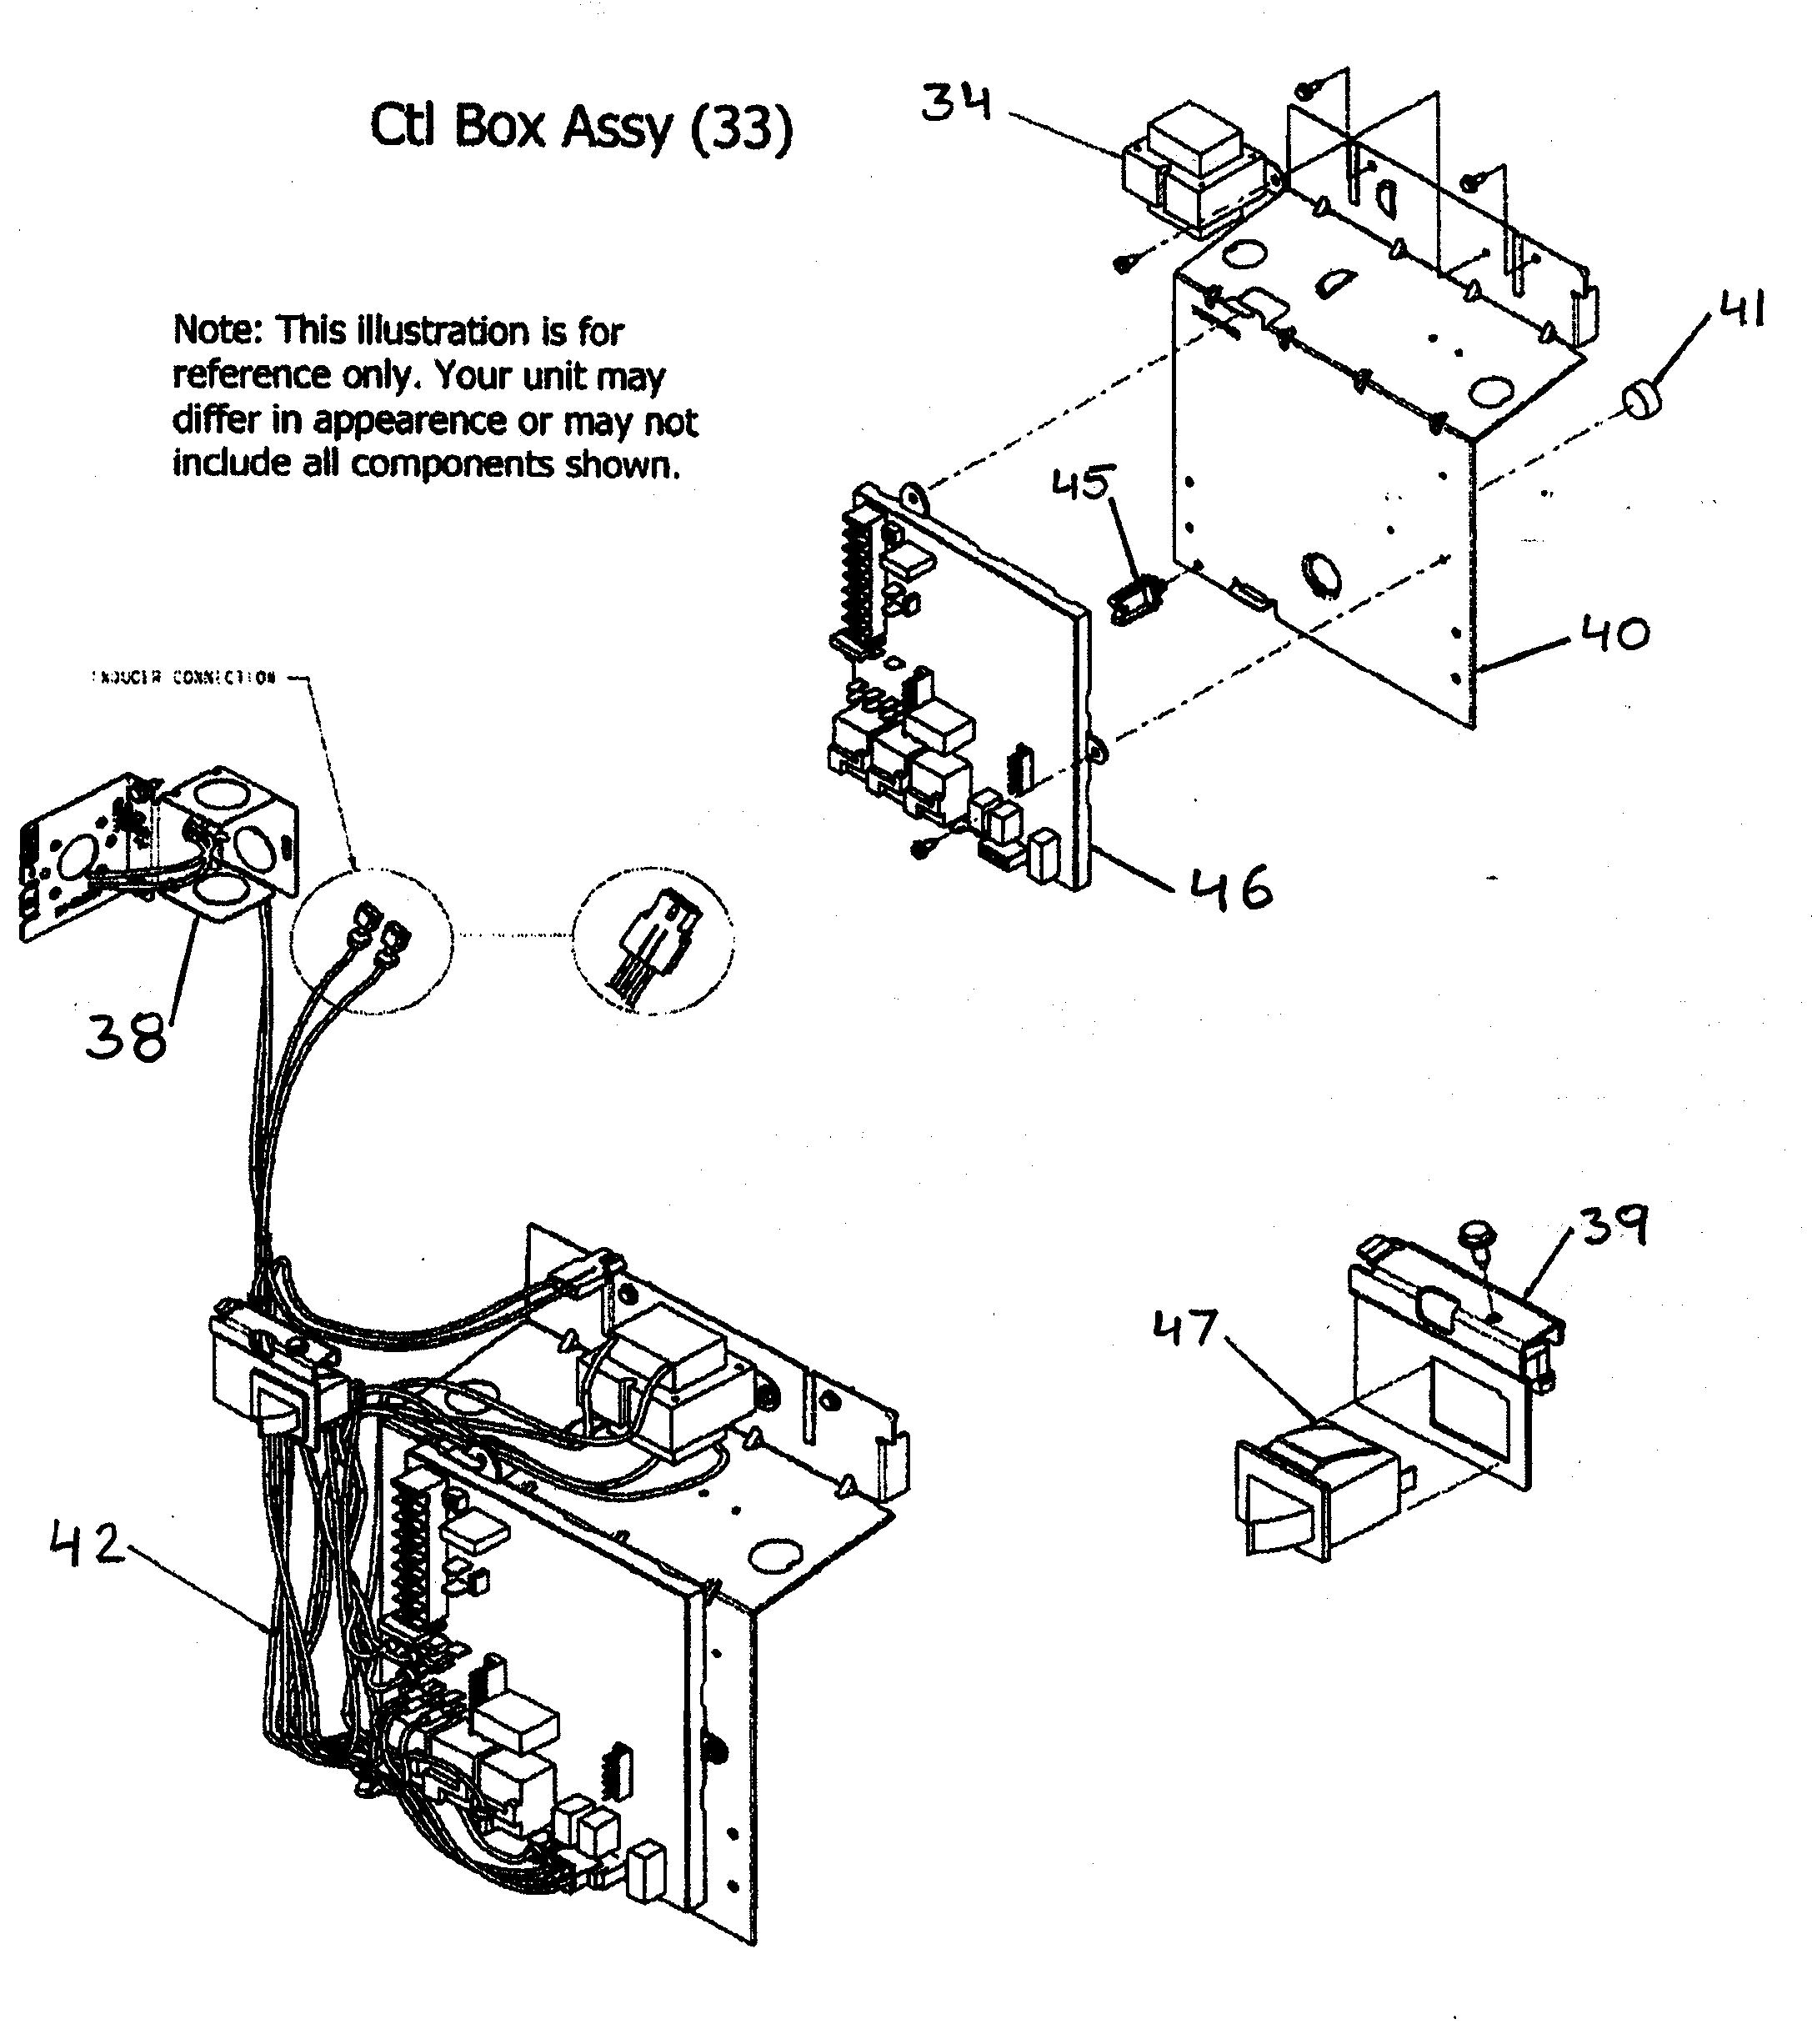 CONTROL BOX ASSY Diagram & Parts List for Model